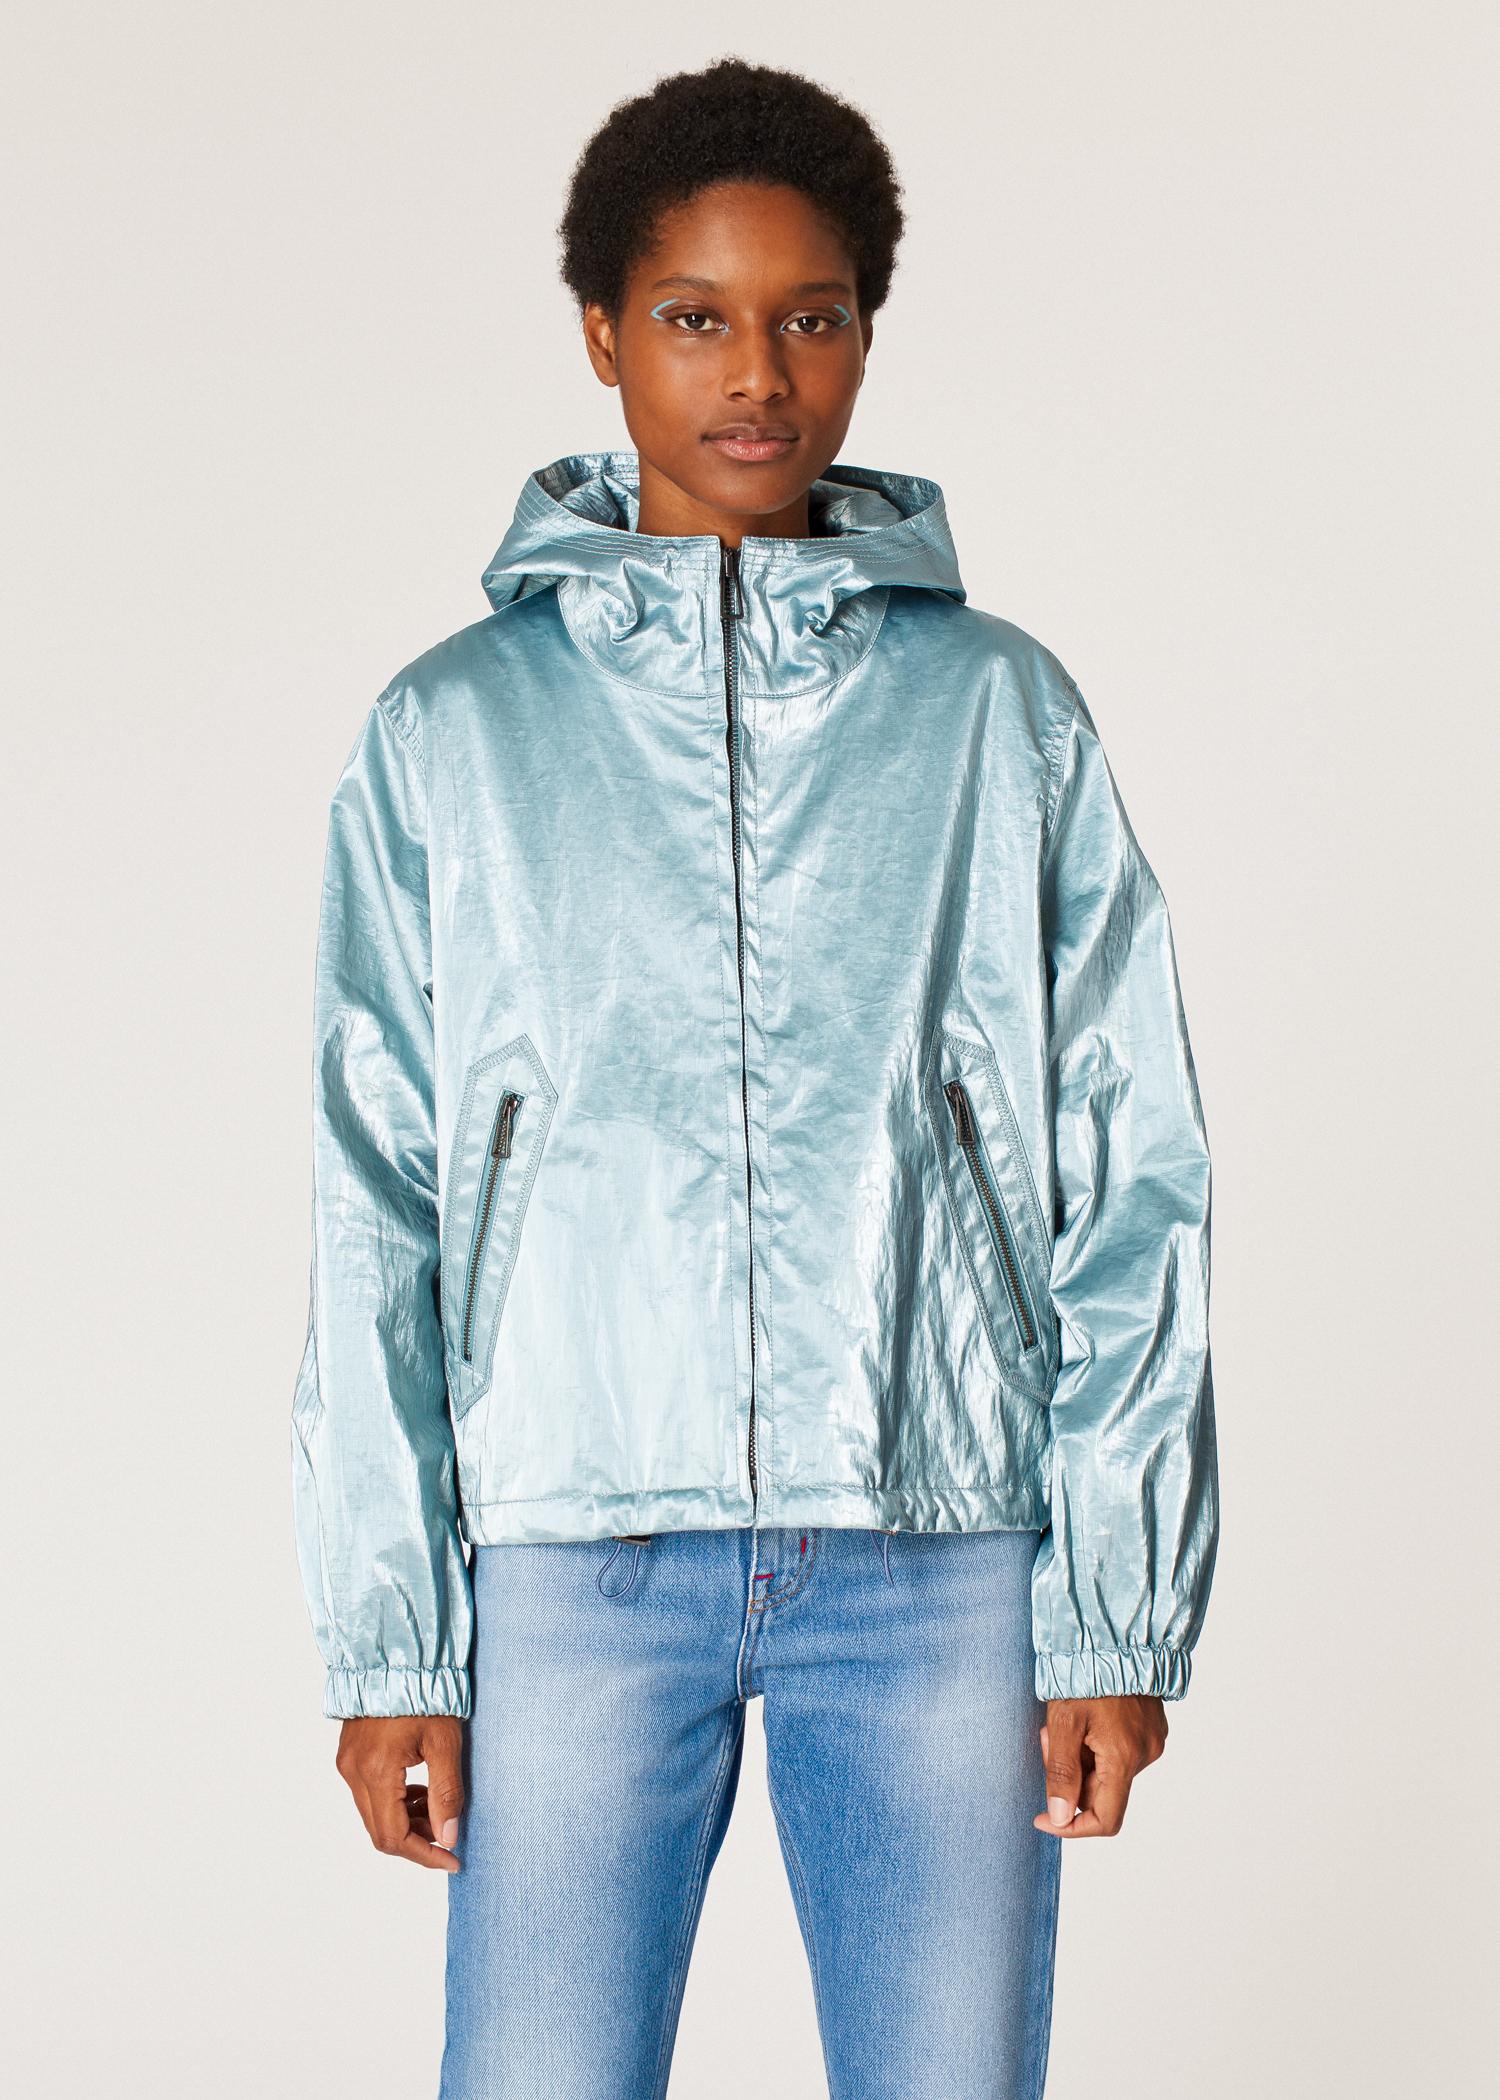 bd8b8f844 Women's Light Blue Coated-Linen Bomber Jacket With Hood